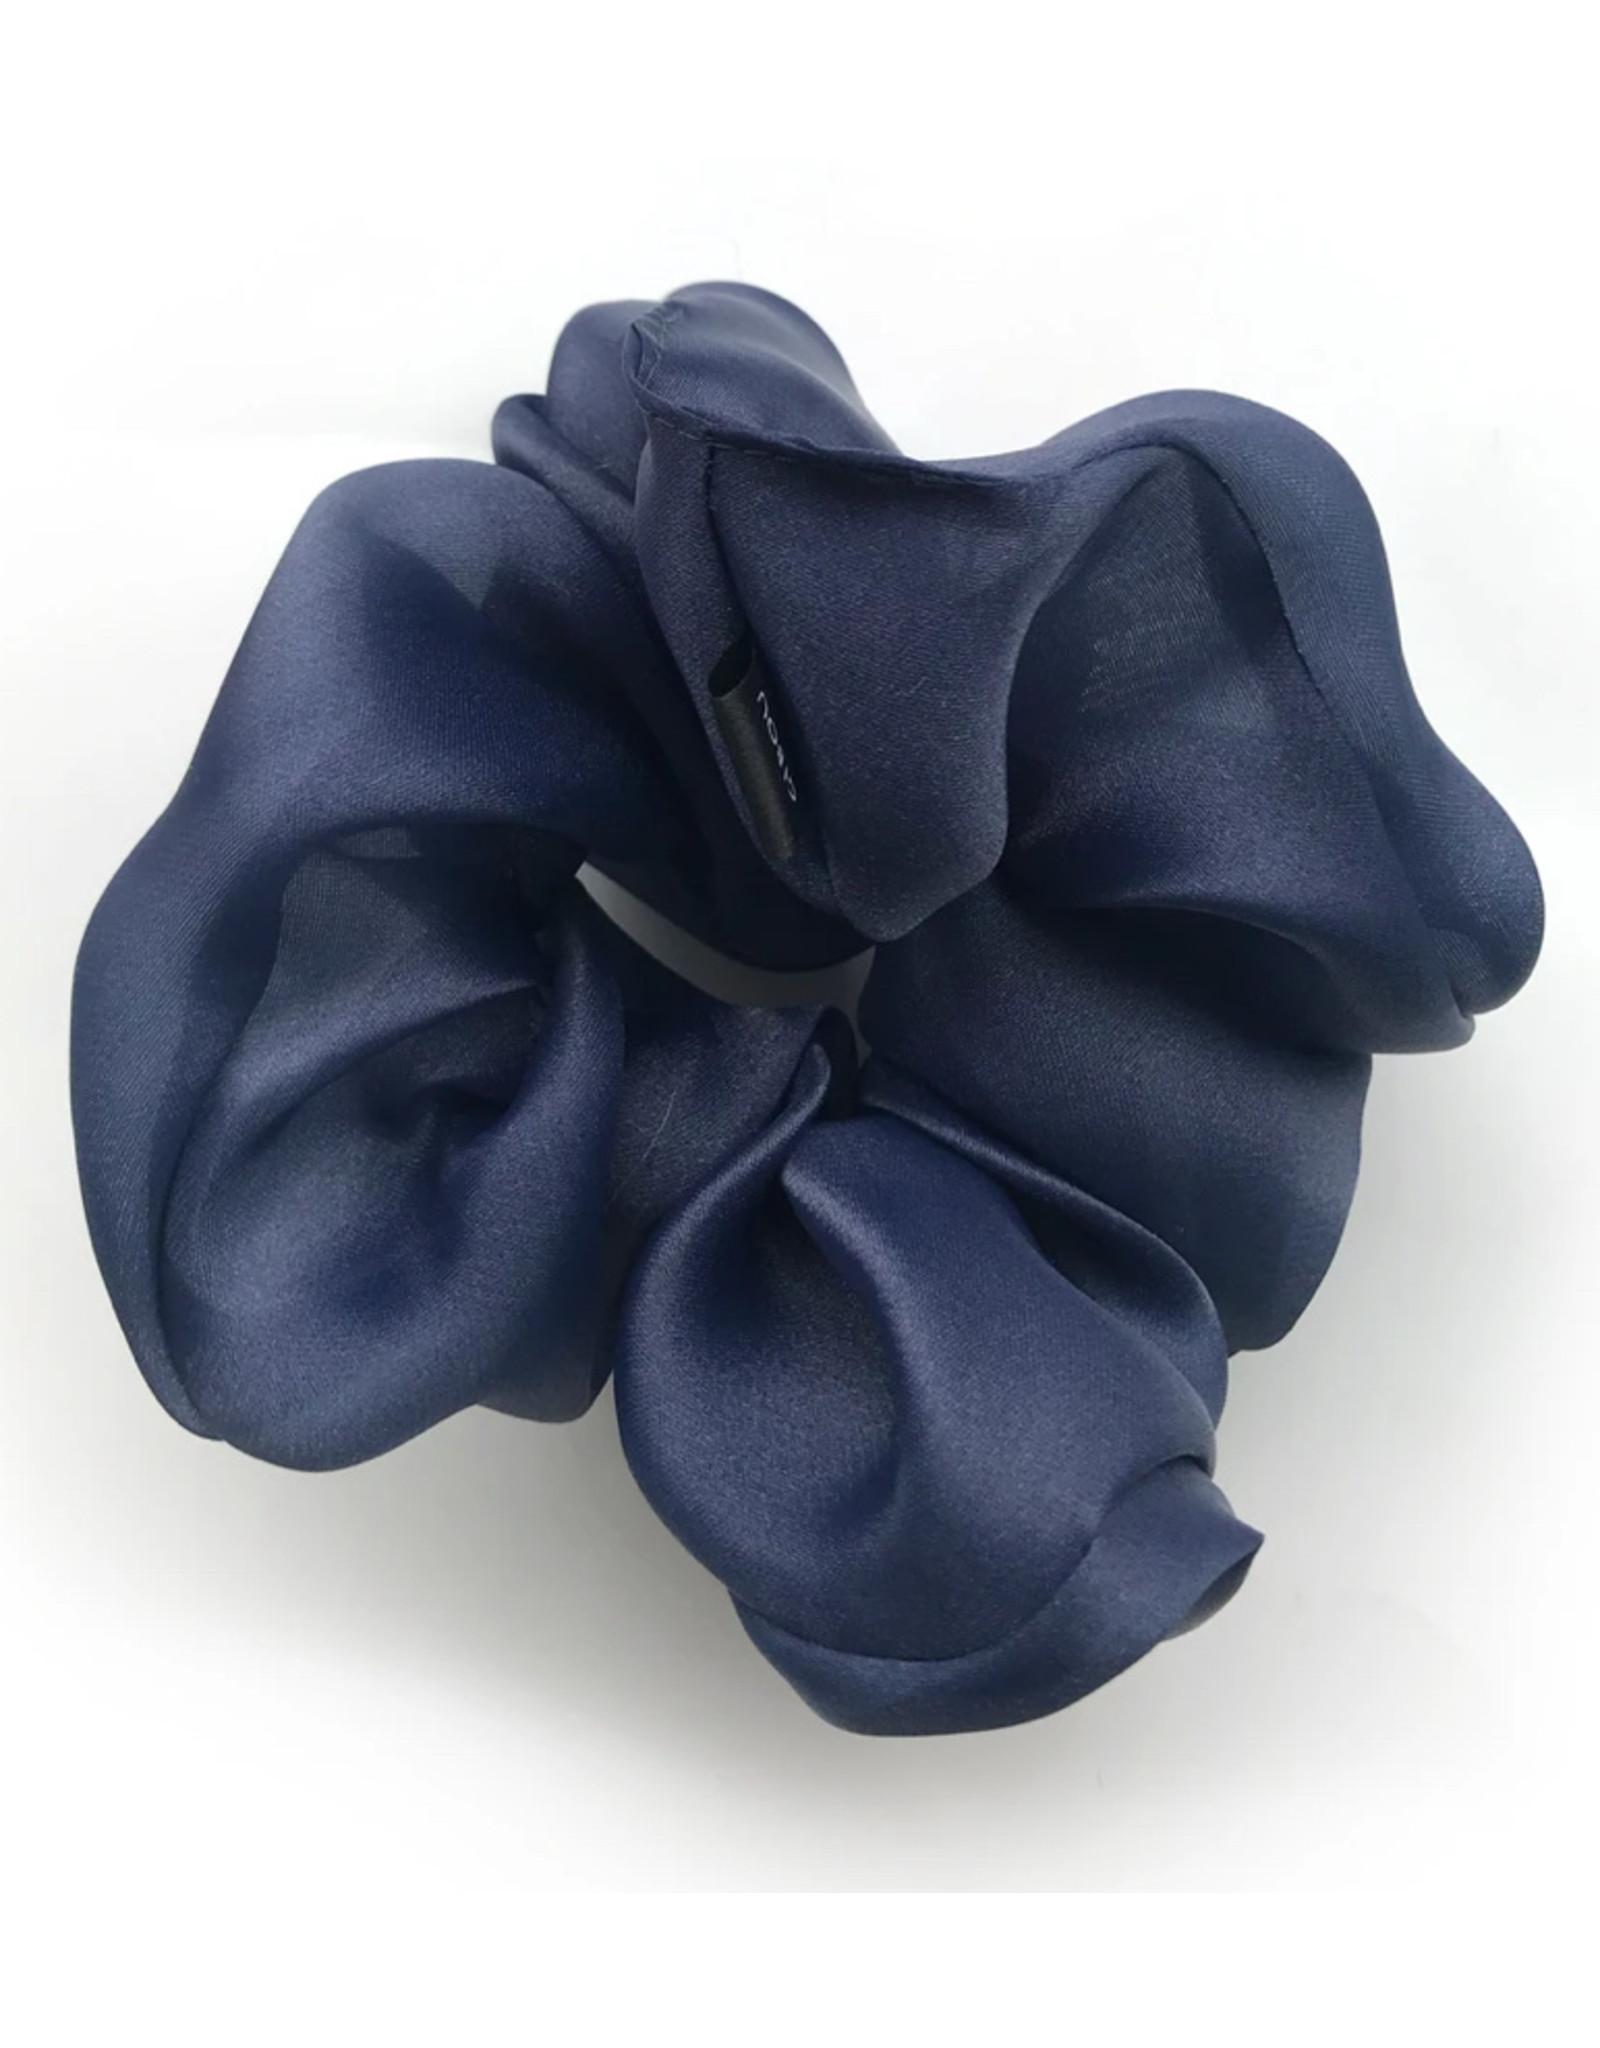 Gibou Chouchou vaporeux - bleu